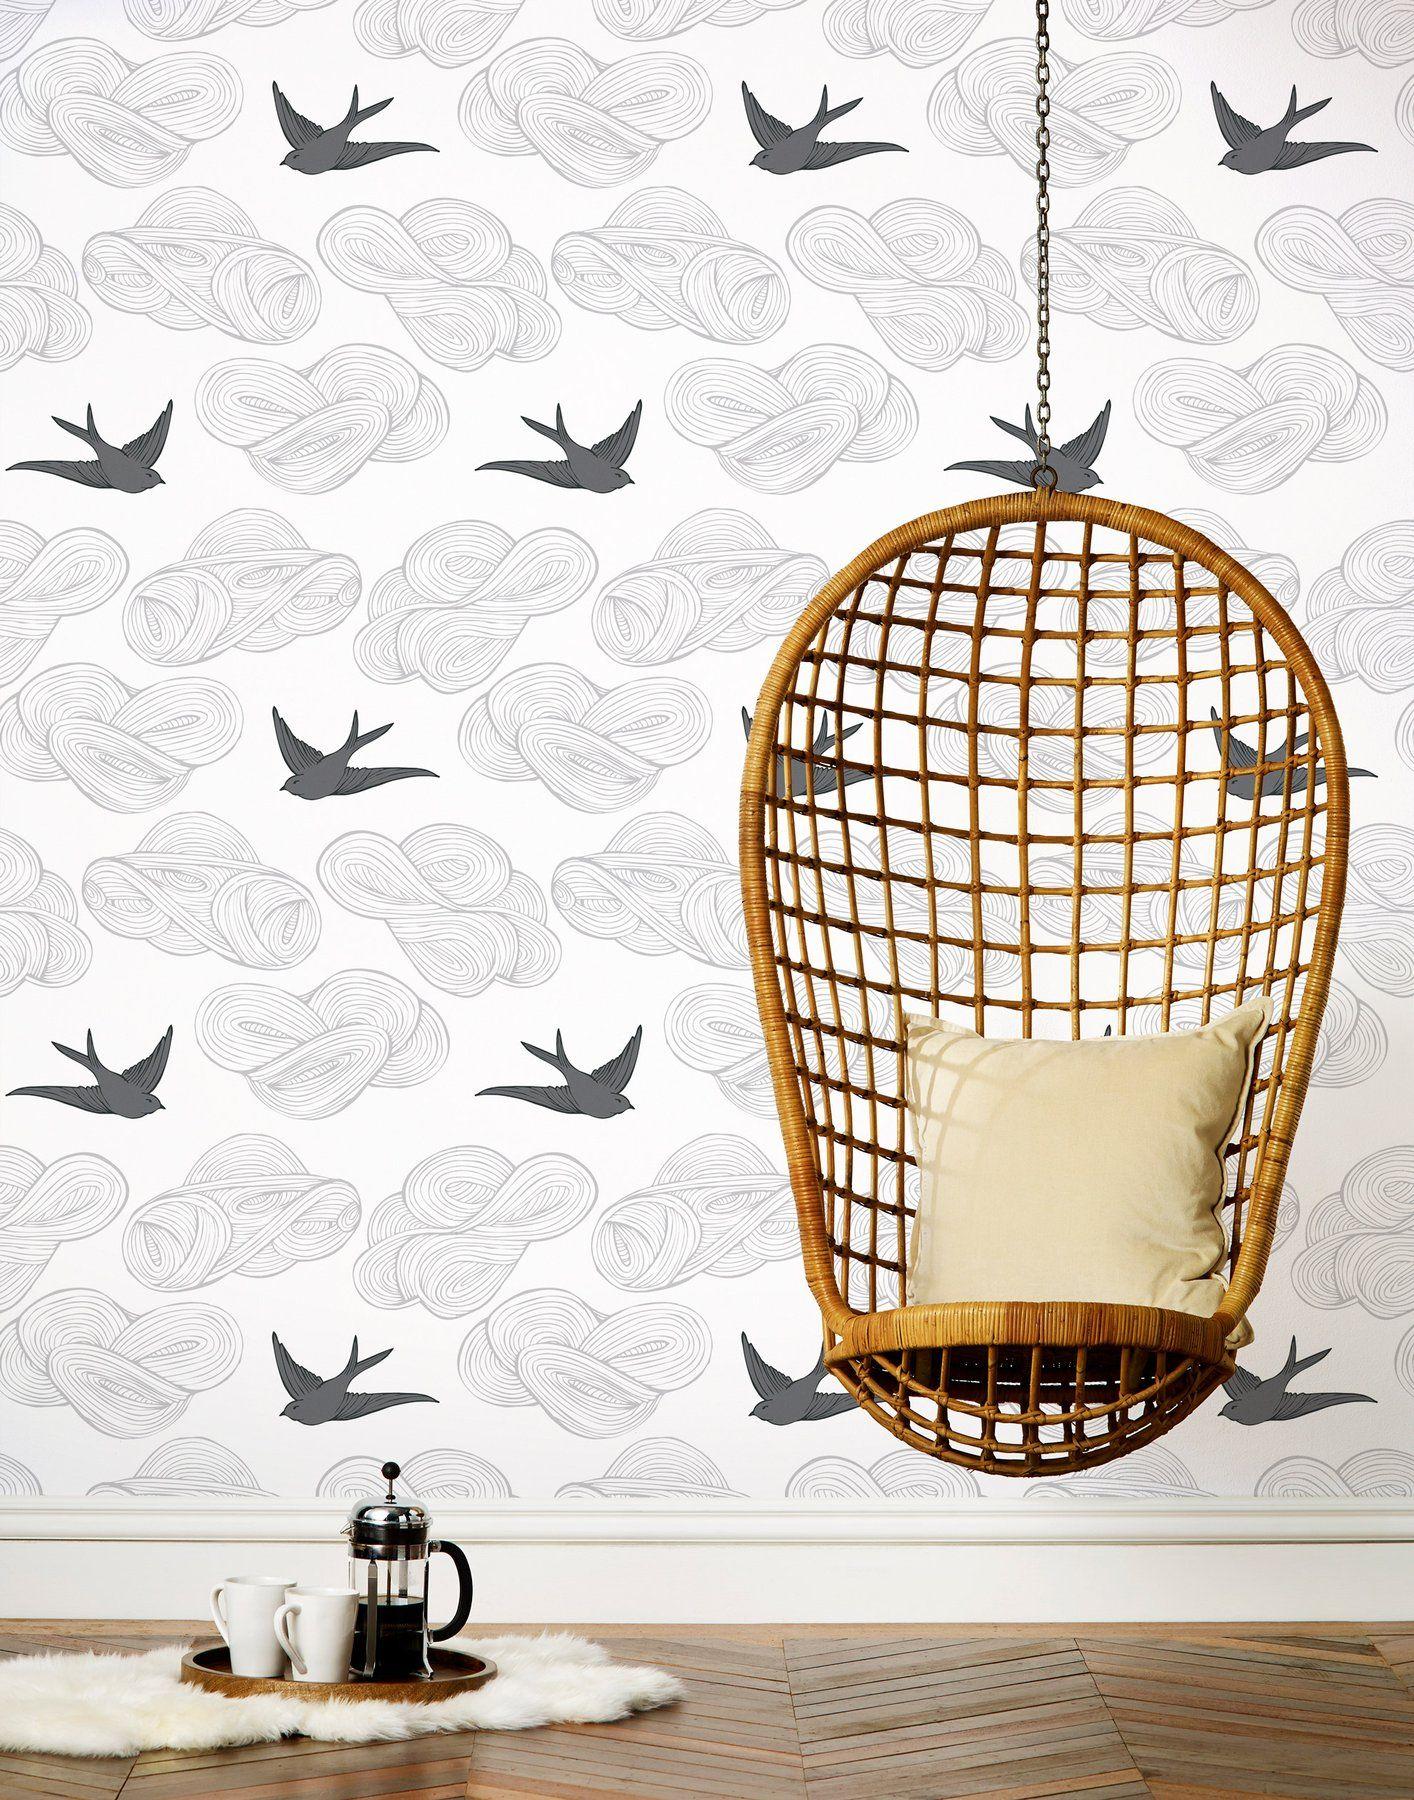 Daydream (Light Gray) Tiles, Set of Tiles Grey removable